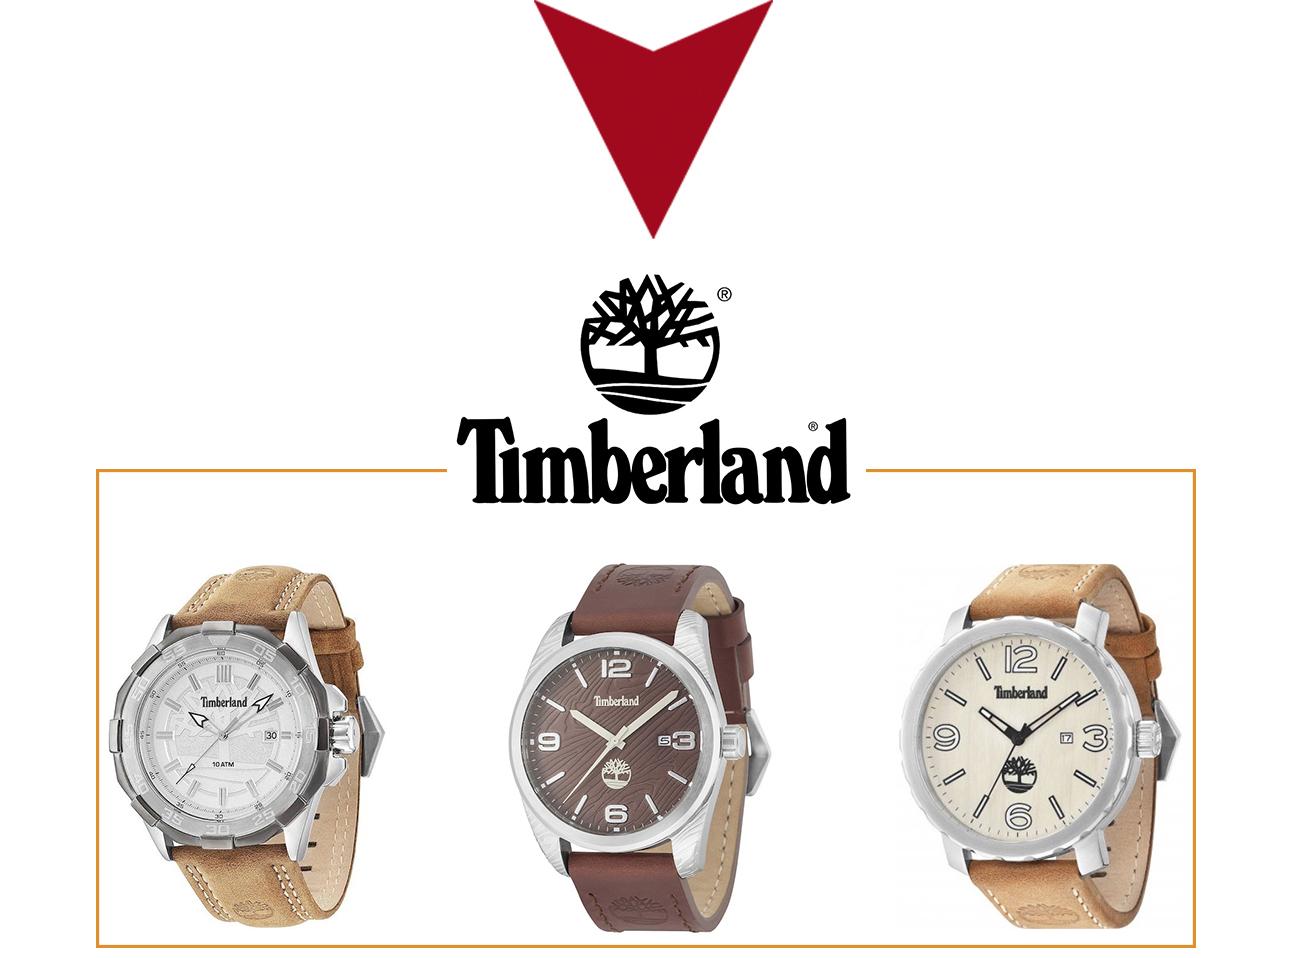 Timberlandwatches